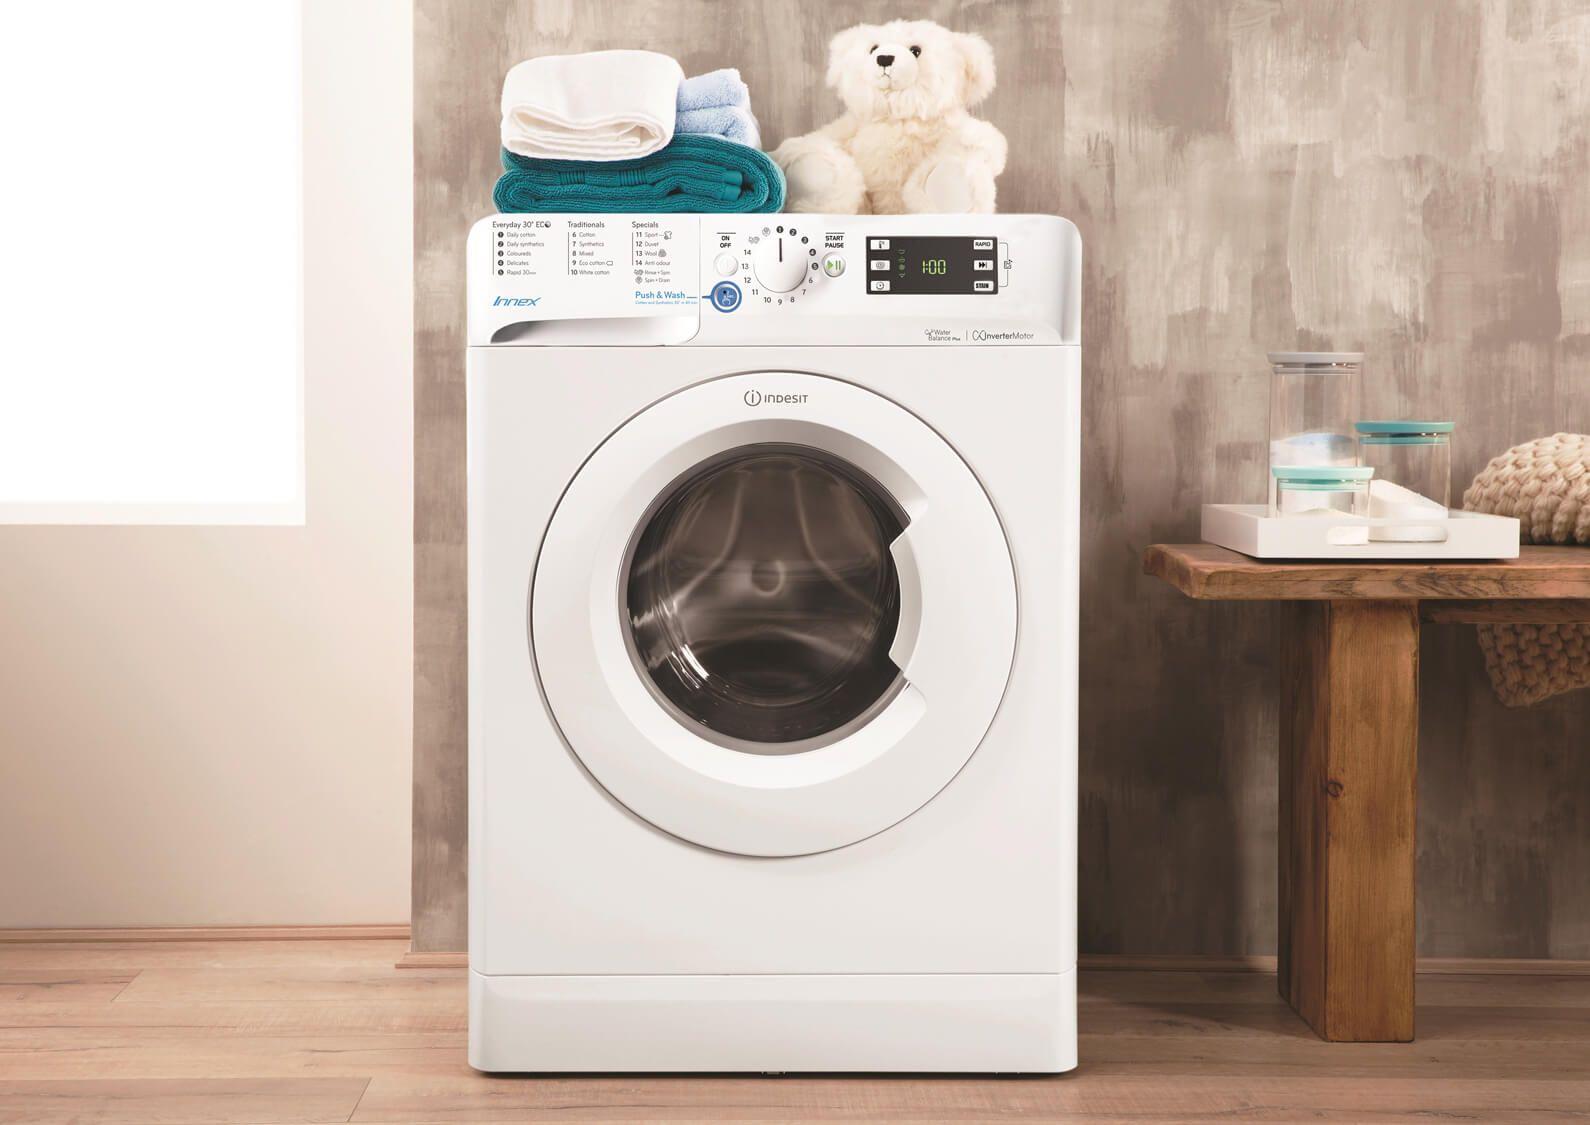 10 Home Appliances You Should Have In Your Home In 2020 Quiet Washing Machine Washing Machine White Washing Machines